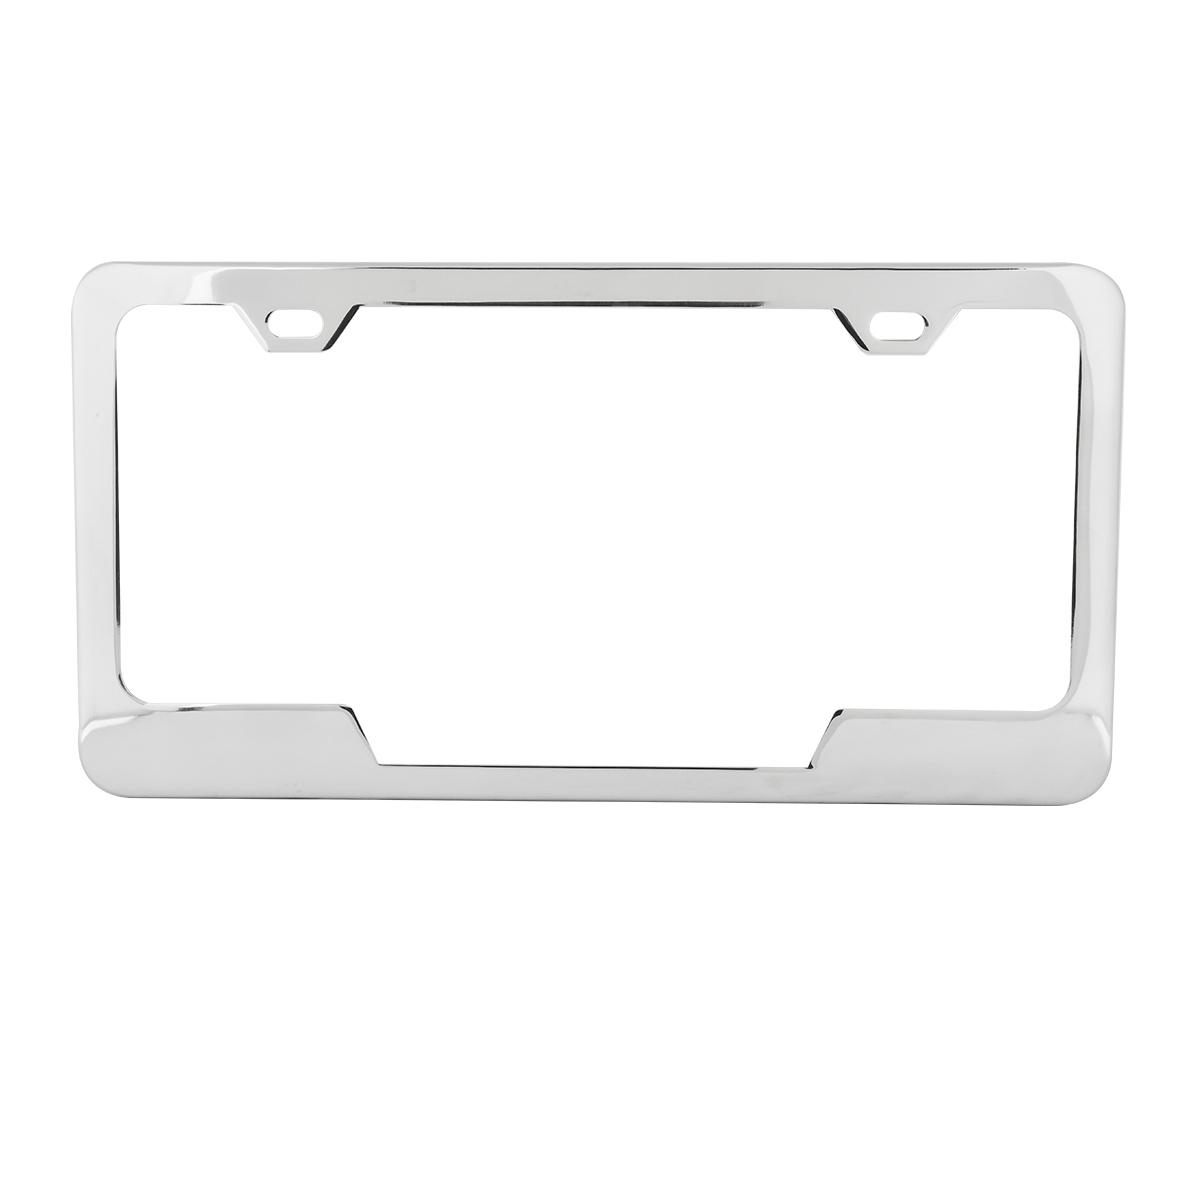 60405 Plain 2-Hole License Plate Frames with Center Cut